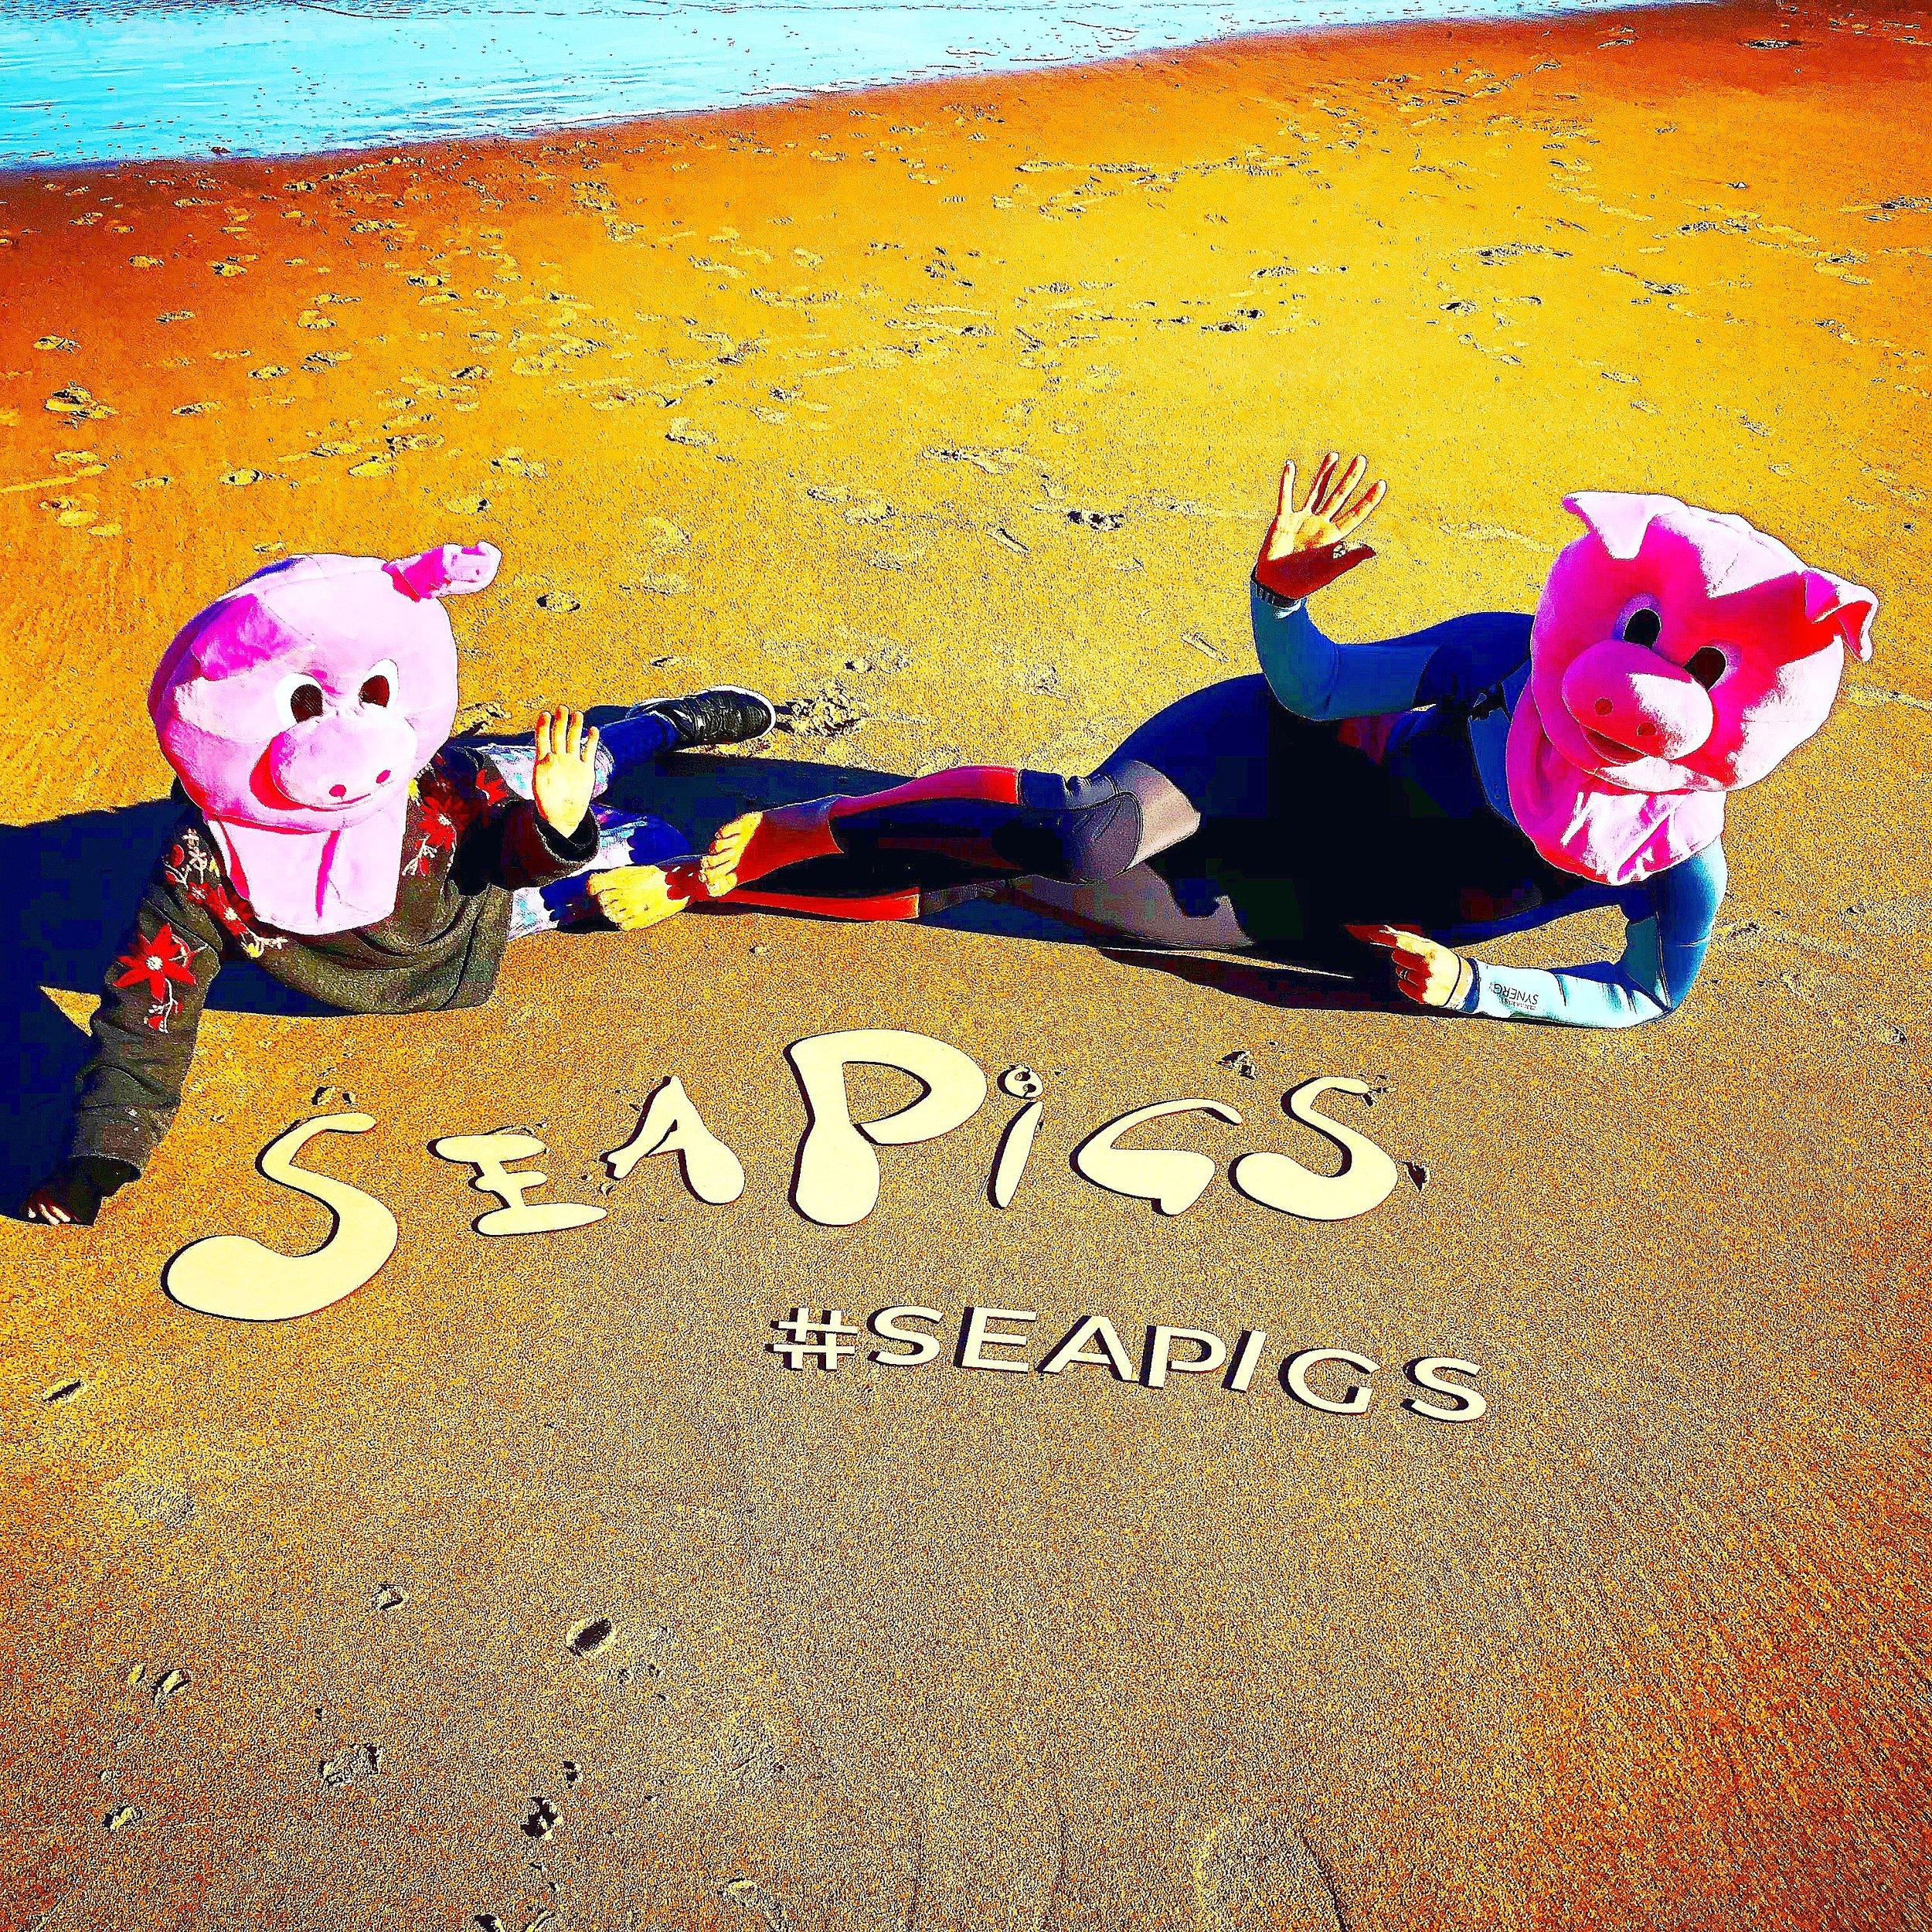 SeaPigs at the Beach